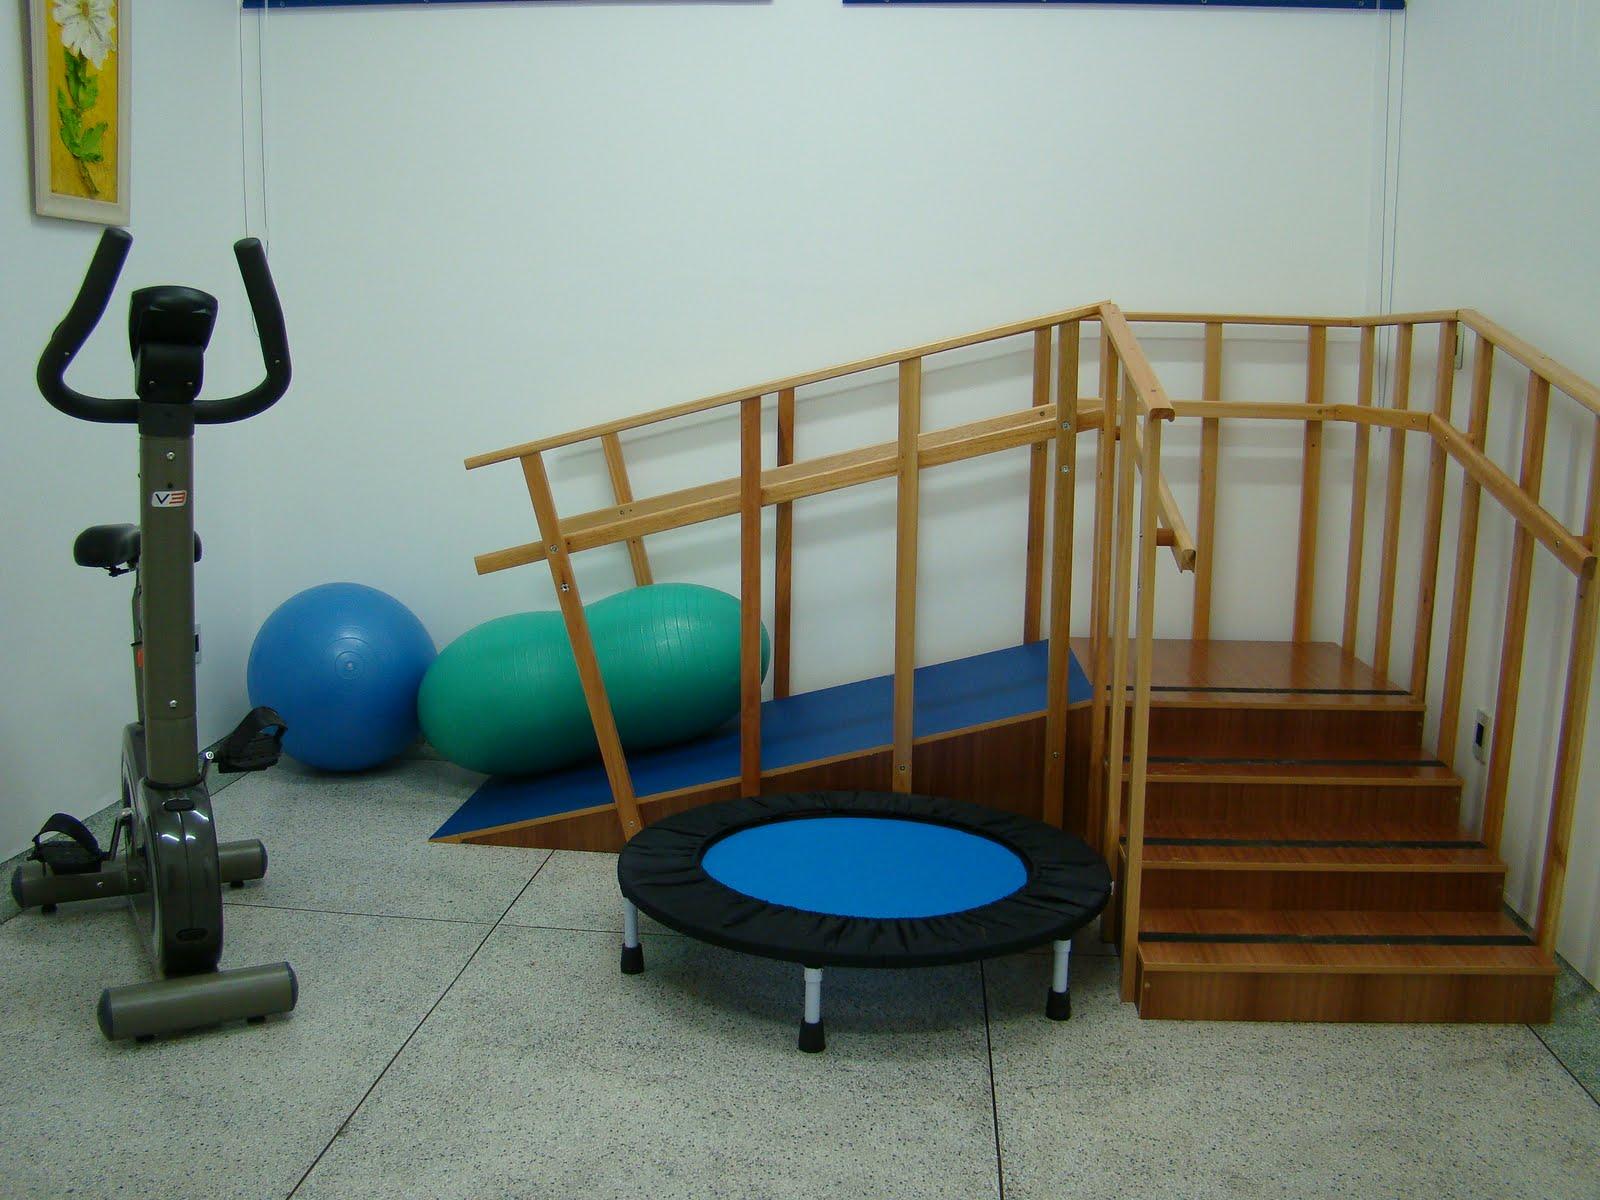 http://2.bp.blogspot.com/_uNk97dbB450/S_LcQSbAntI/AAAAAAAAAmA/mpIt5aRw_LU/s1600/Parte+dos+aparelhos+a+serem+utilizados+na+fisioterapia.jpg